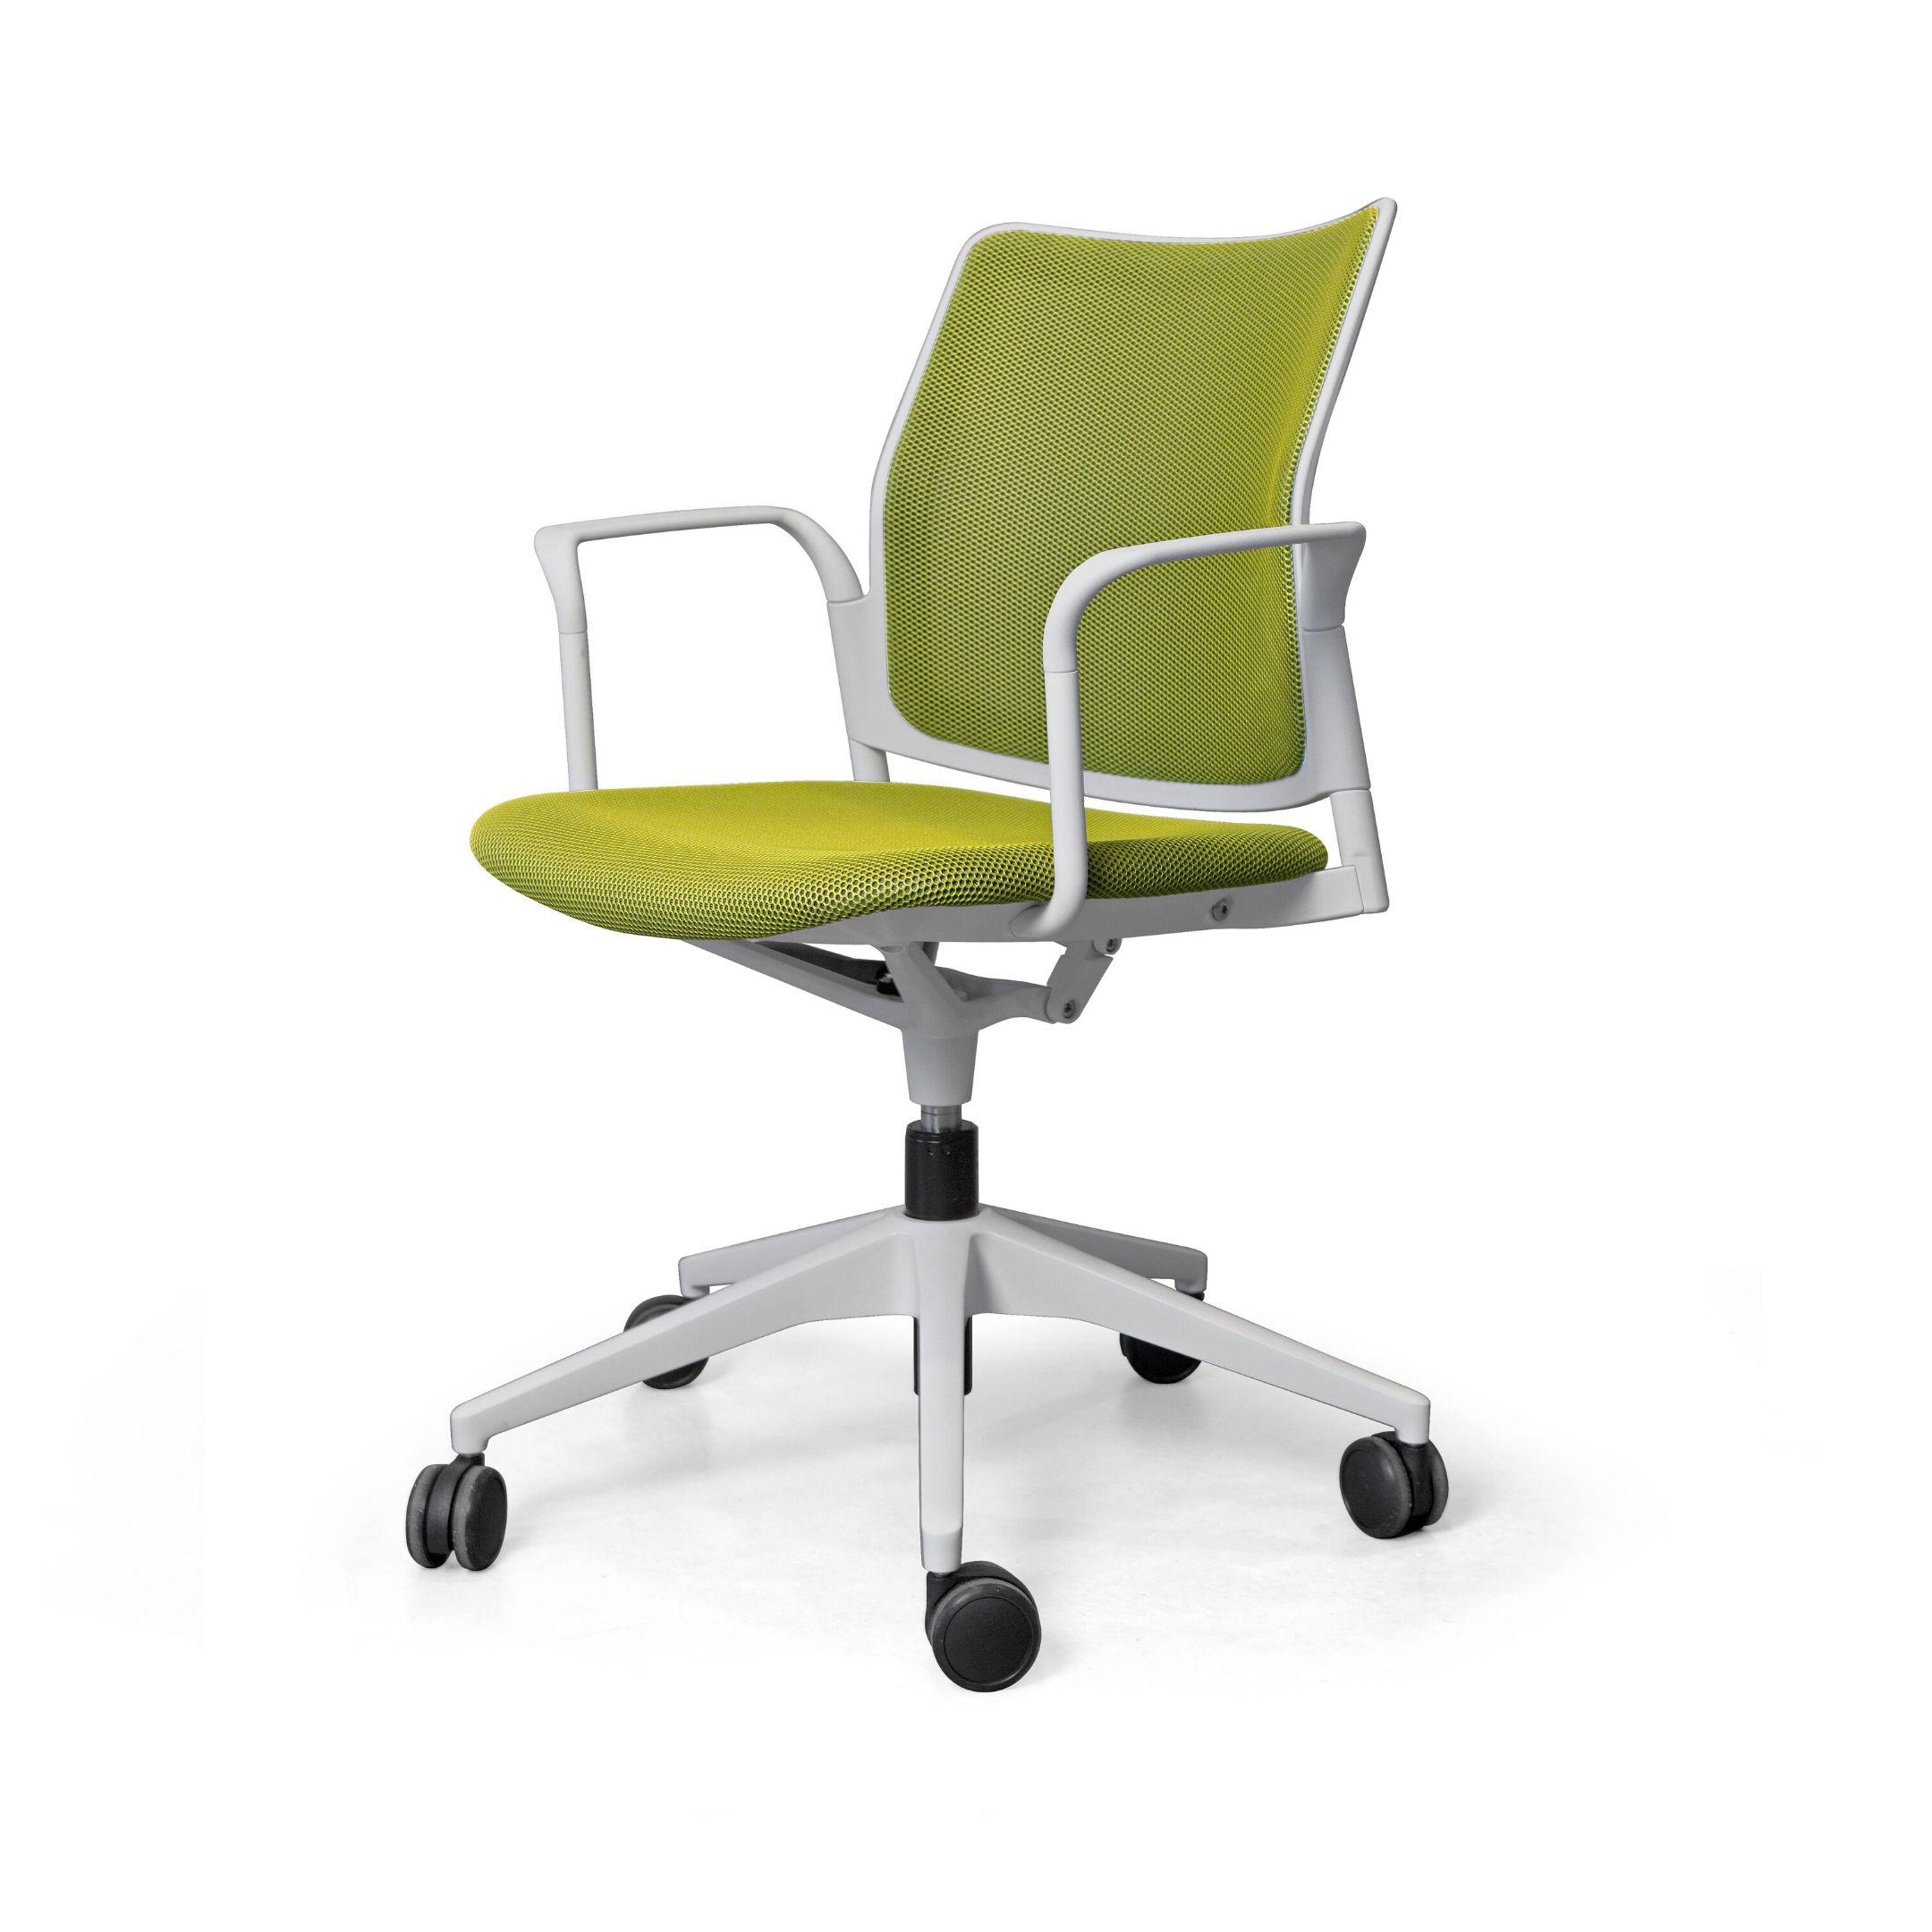 silla de oficina verde con brazos